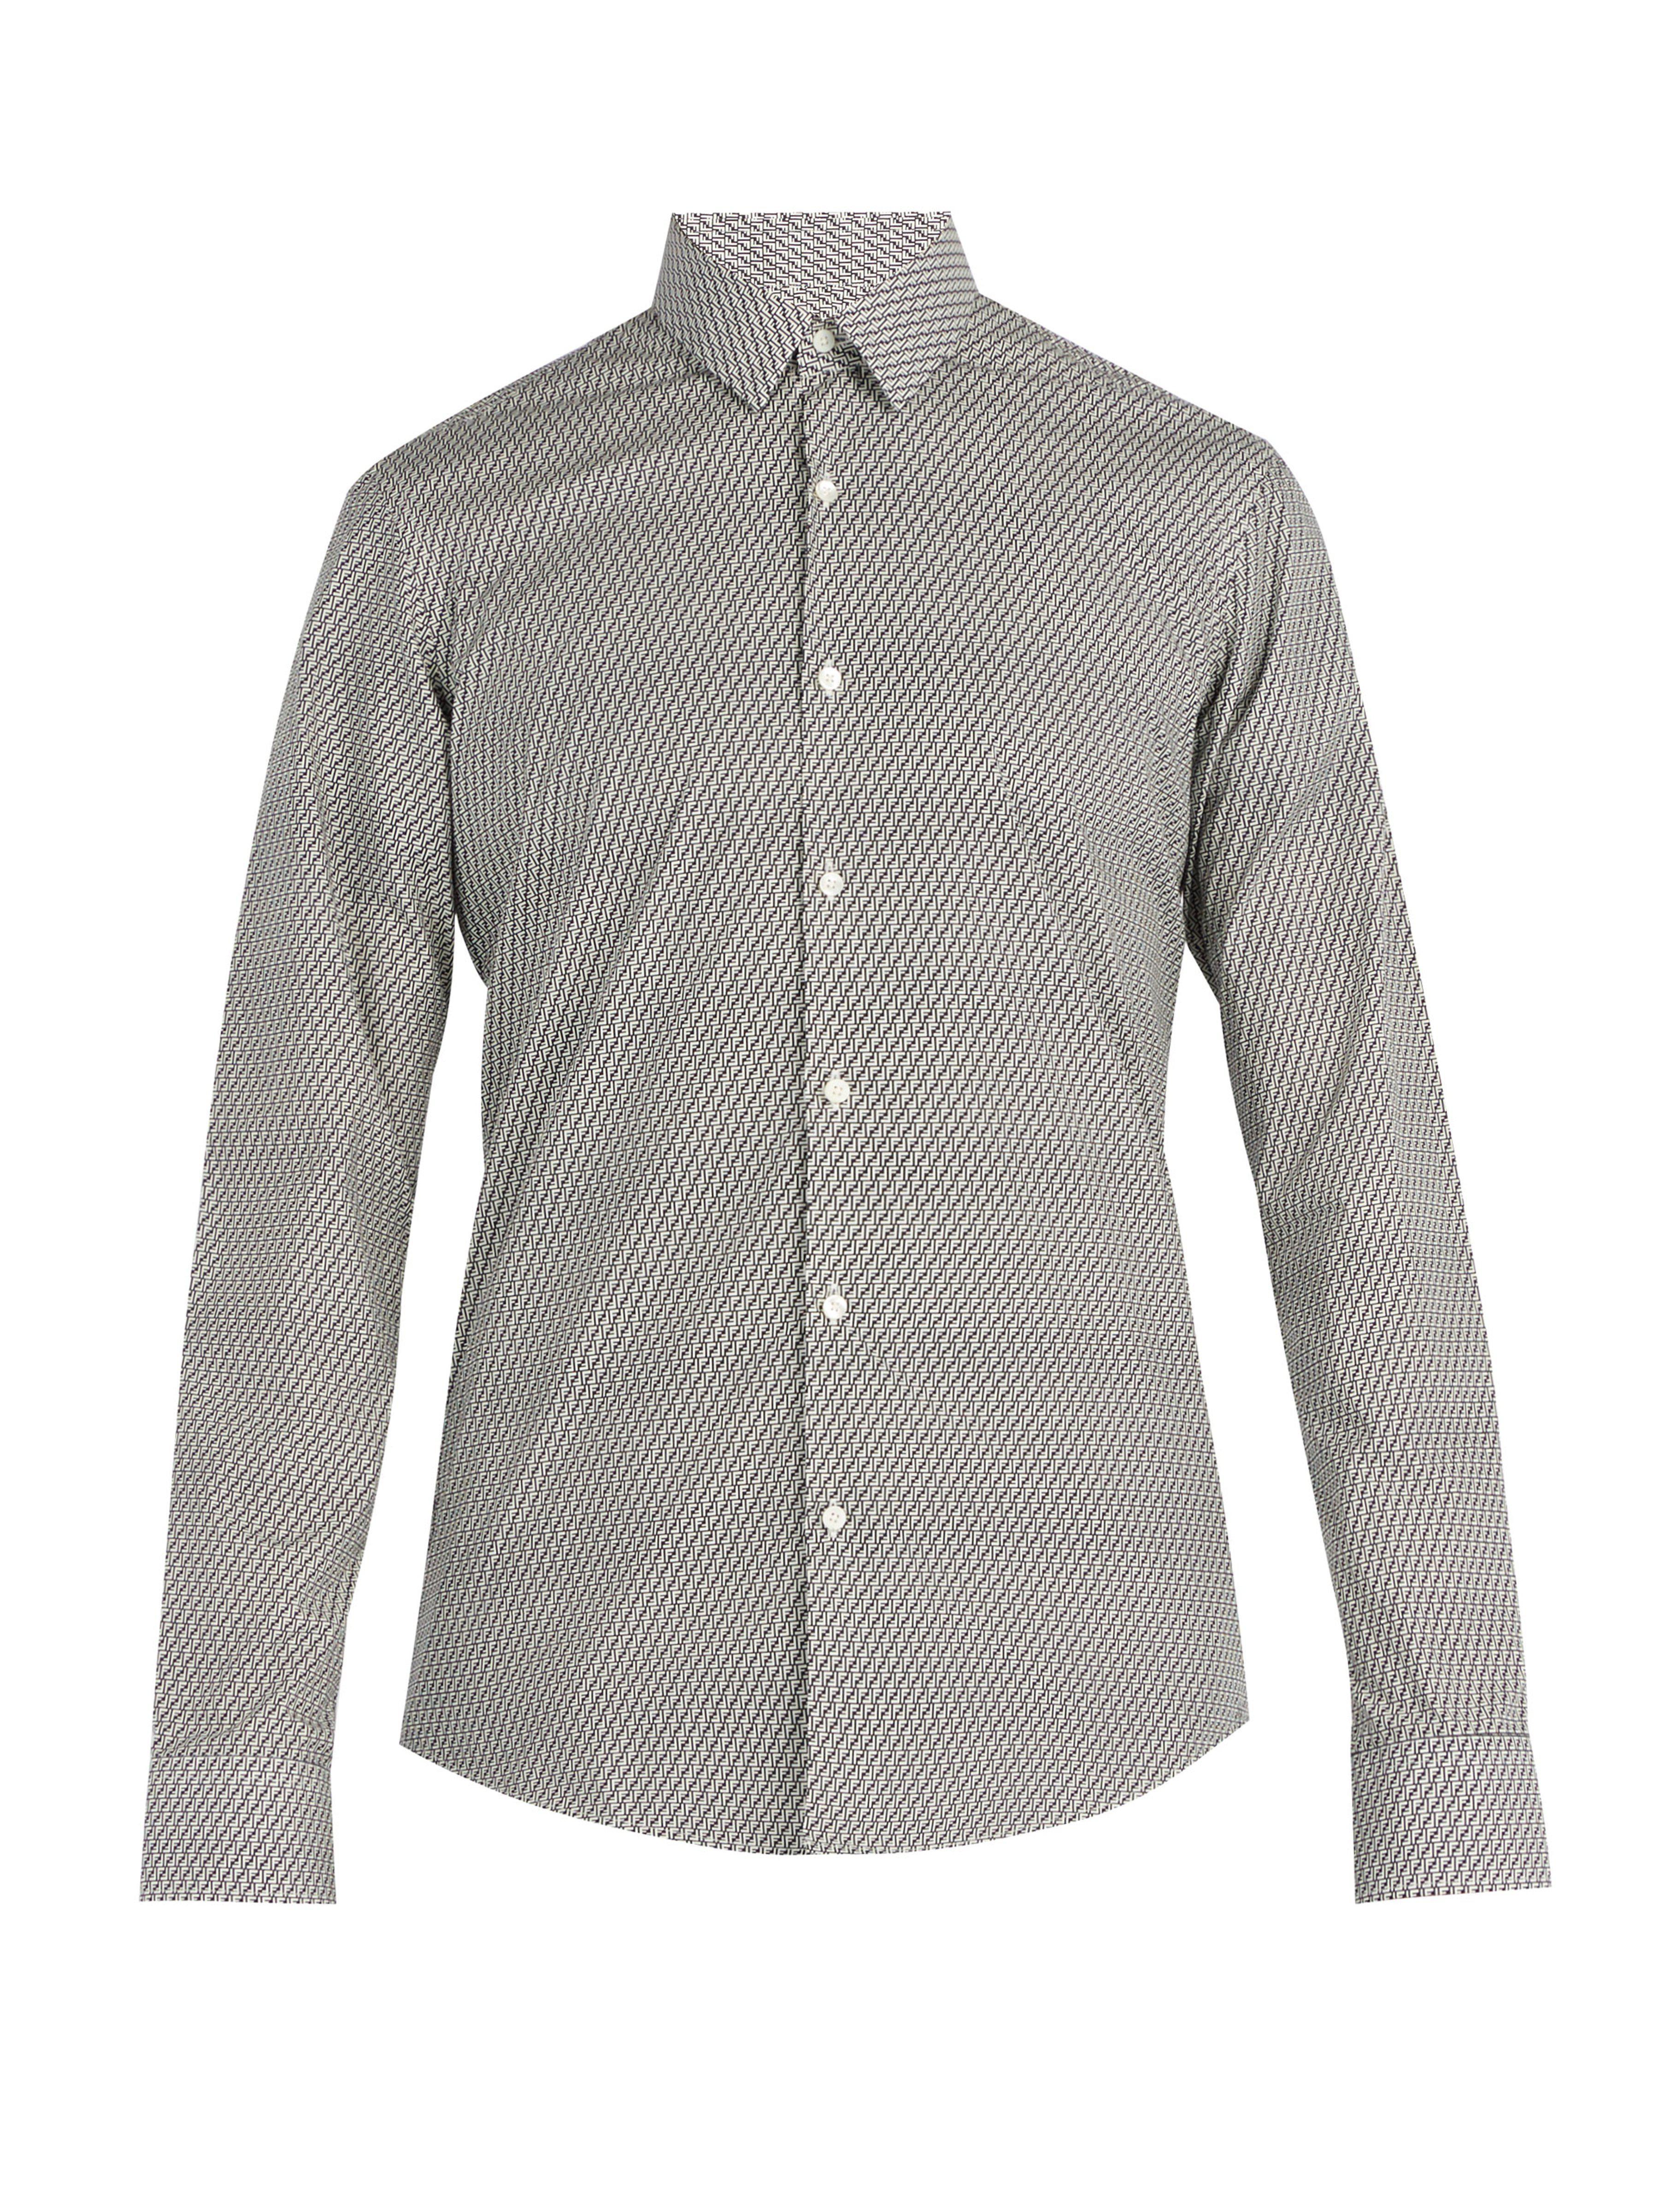 00a5d01e7043 Fendi Ff Print Cotton Shirt in Gray for Men - Lyst